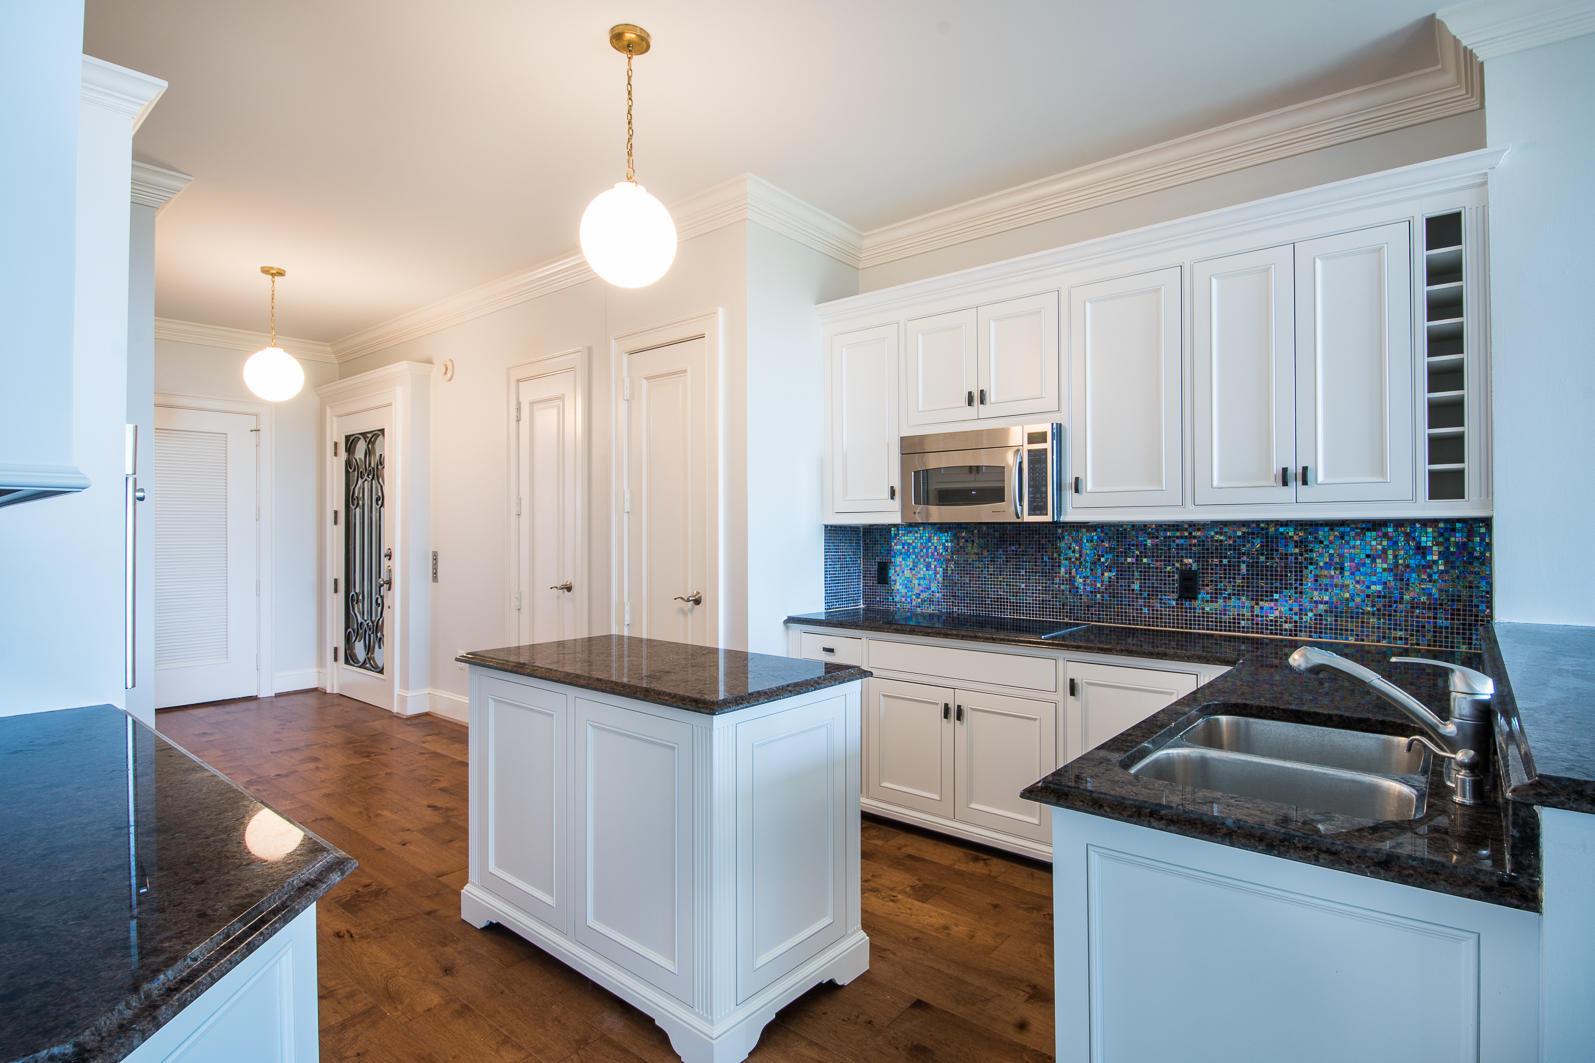 Renaissance On Chas Harbor Homes For Sale - 144 Plaza, Mount Pleasant, SC - 32